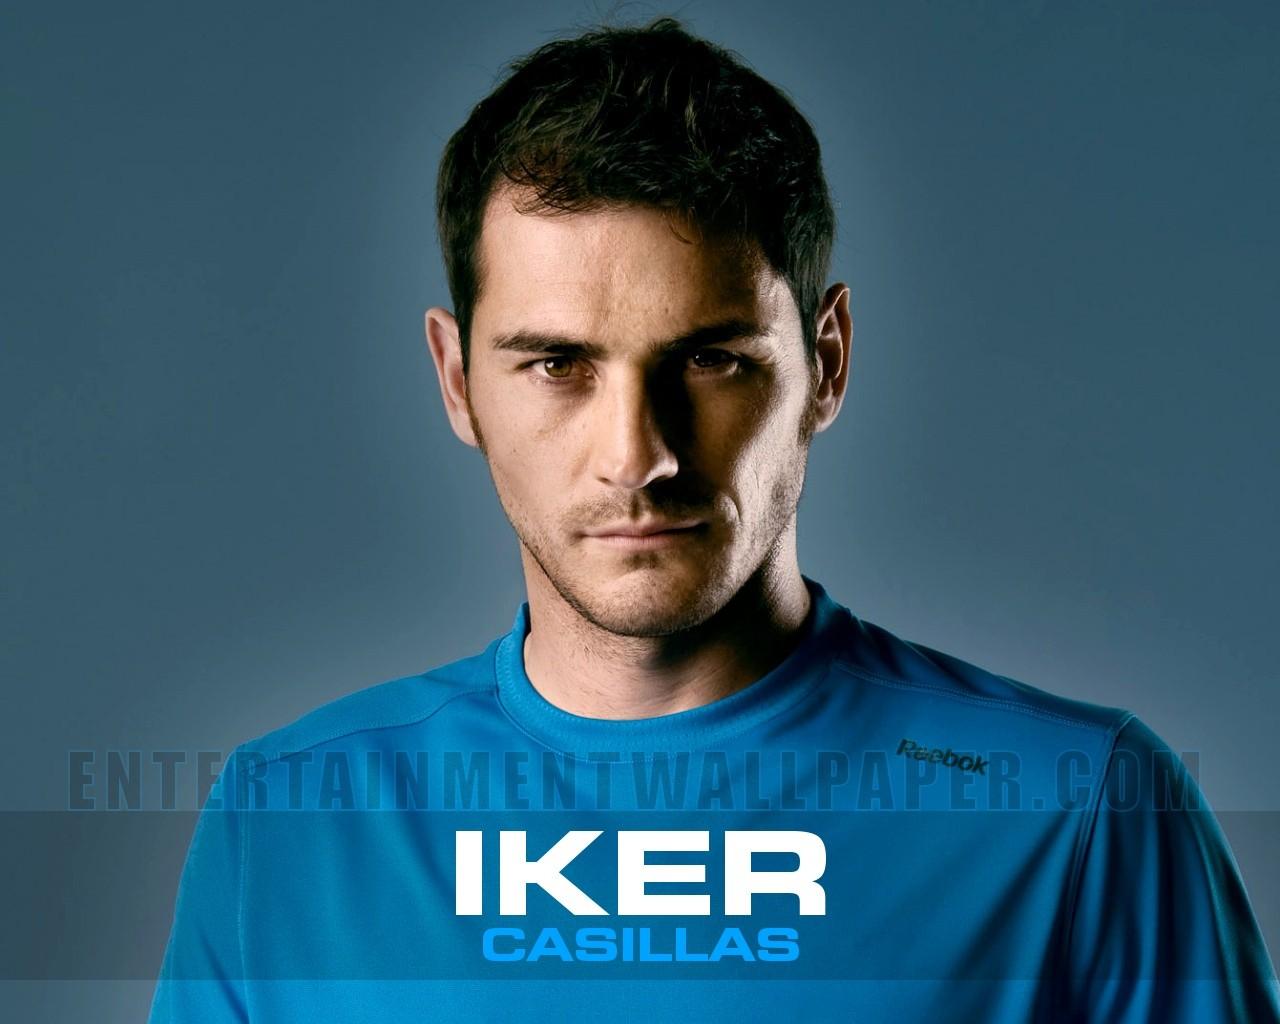 Iker Casillas Masculine - Iker Casillas Masculine